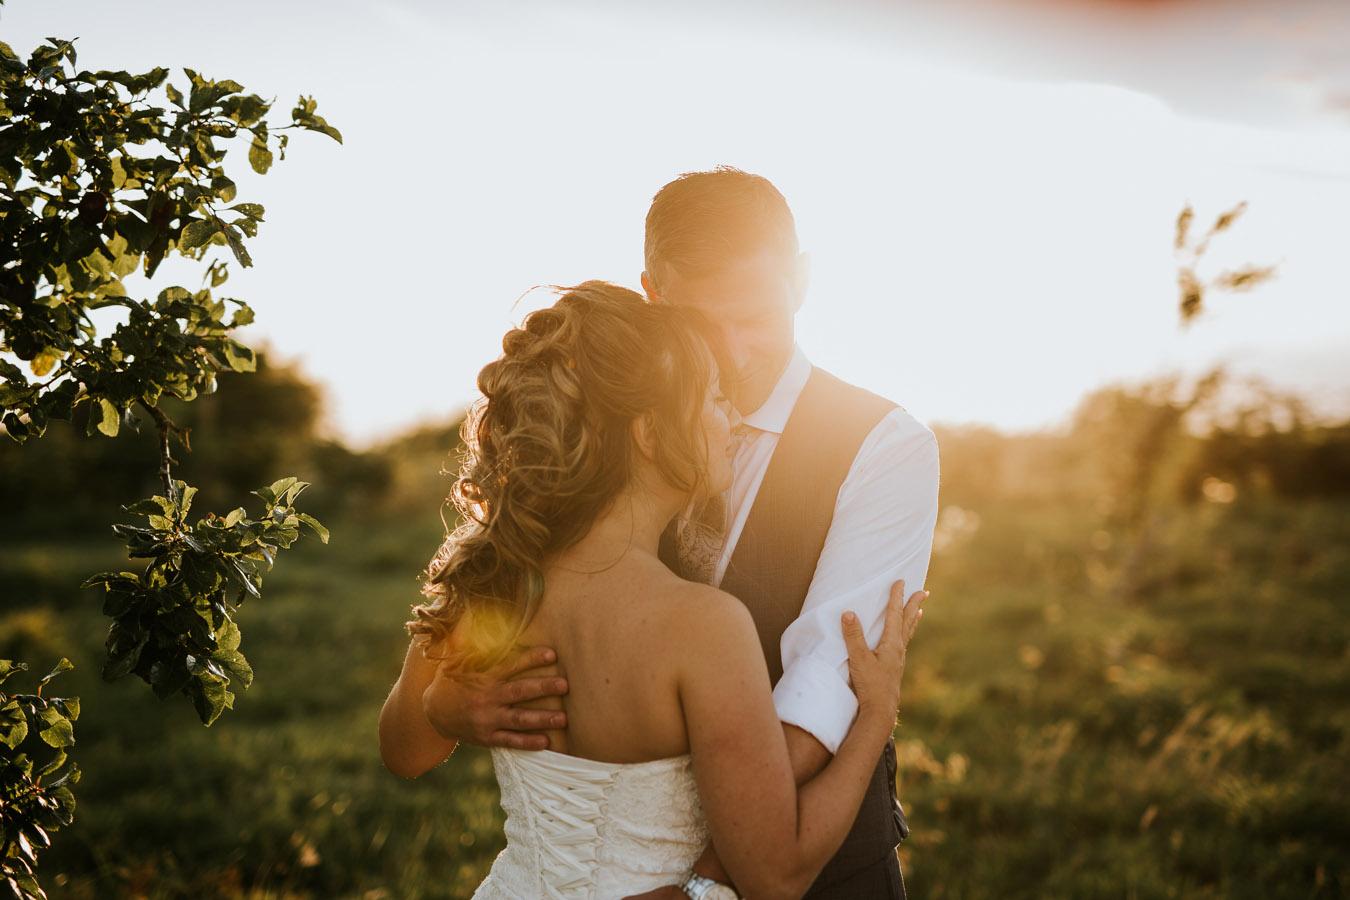 Fotograf-Tone-Tvedt-bryllup-181.jpg